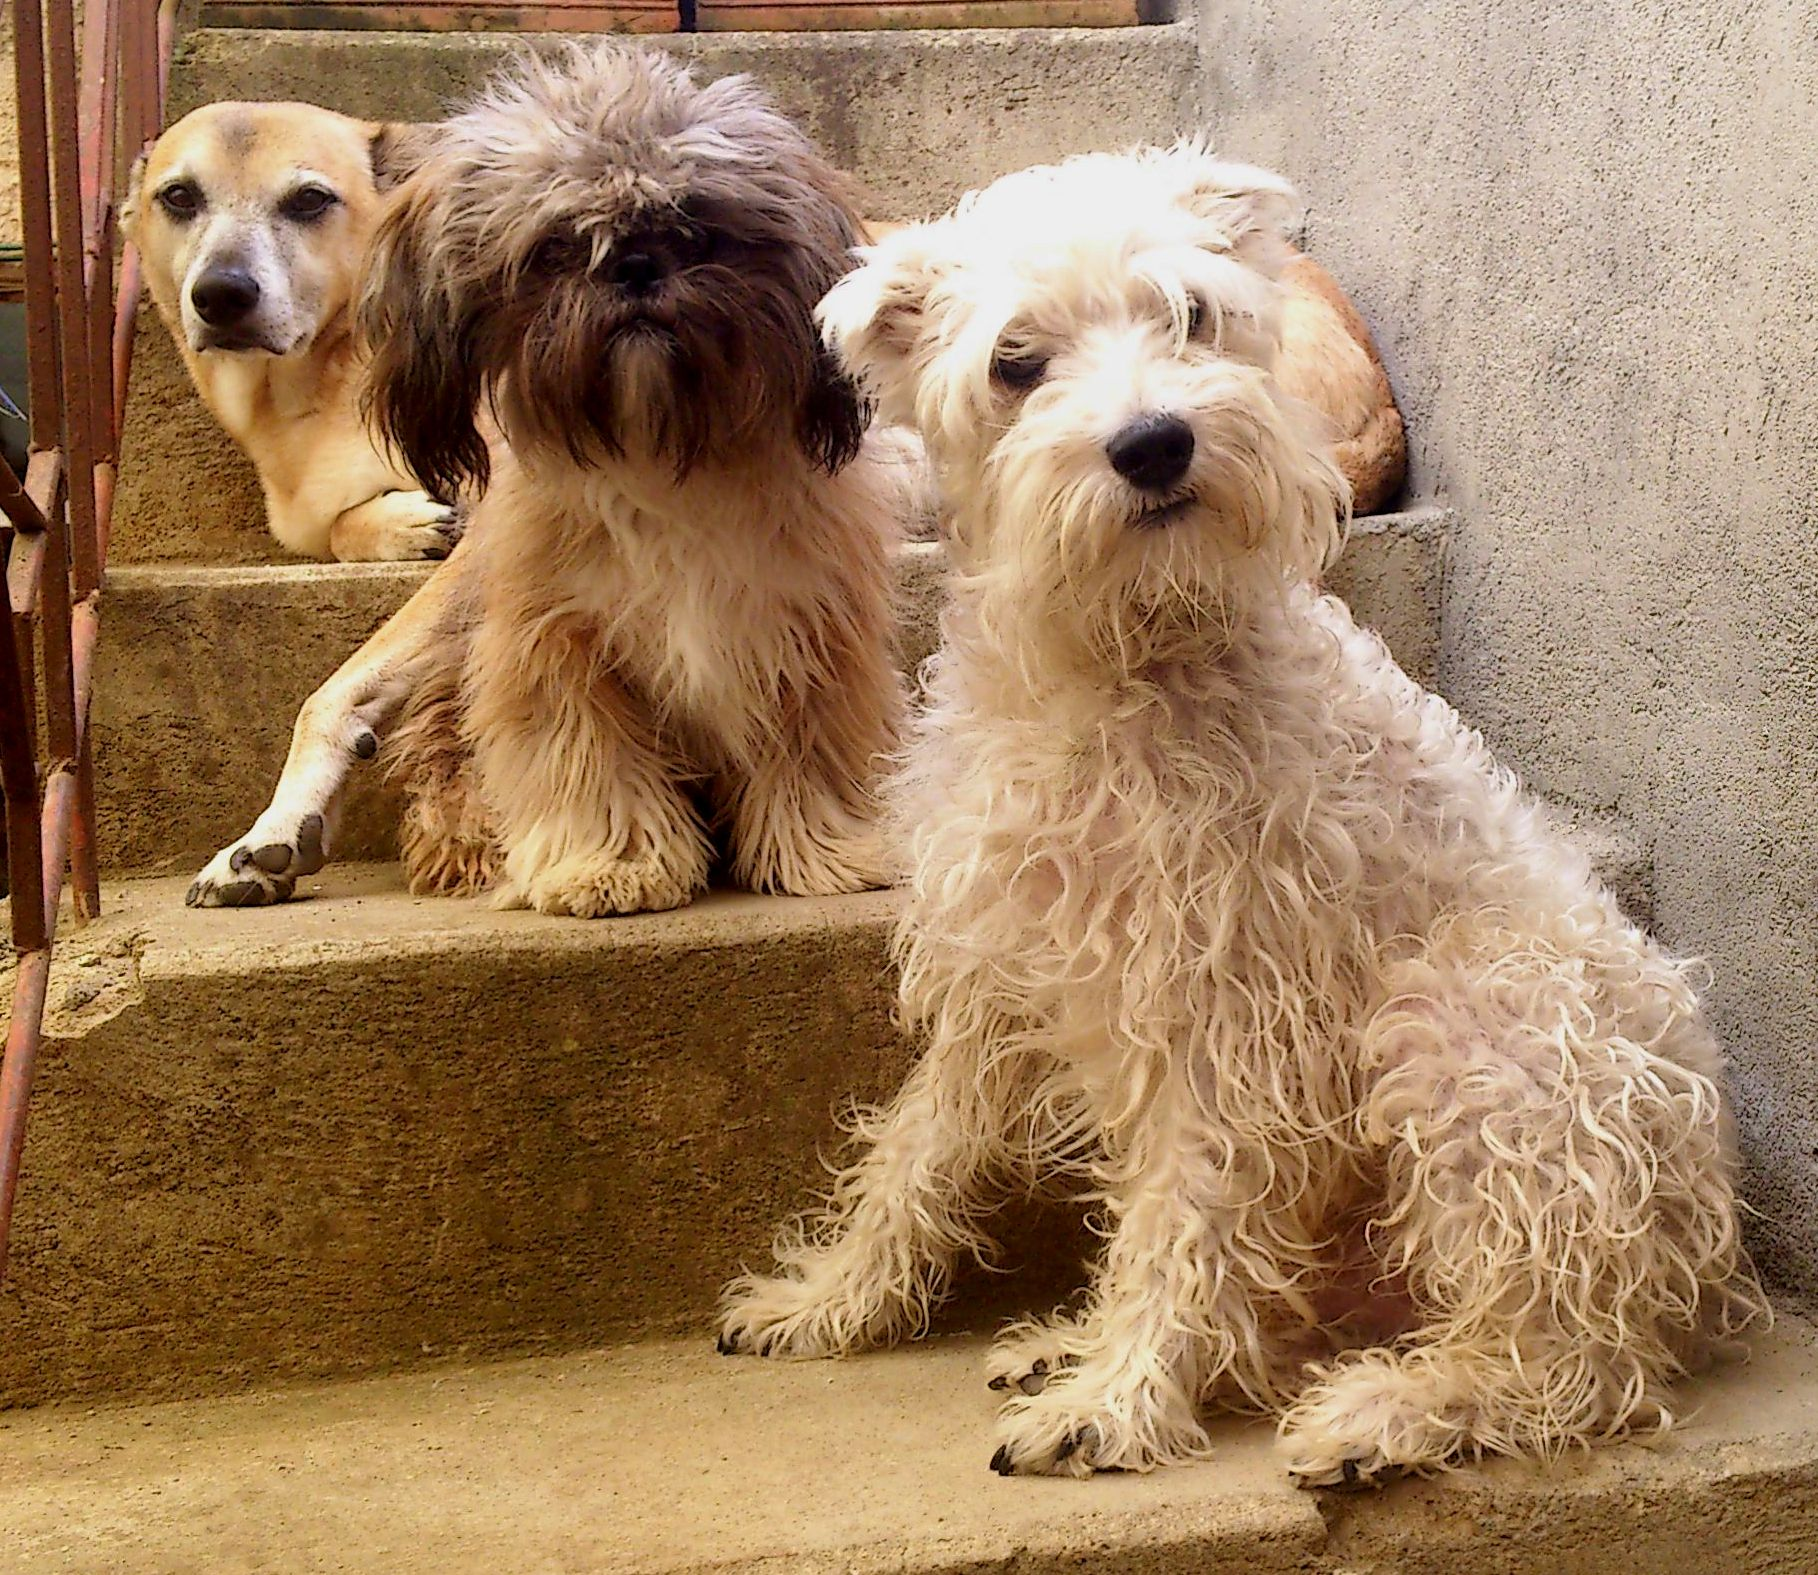 Oddie, Yupi, Firulais - My pets, my family.